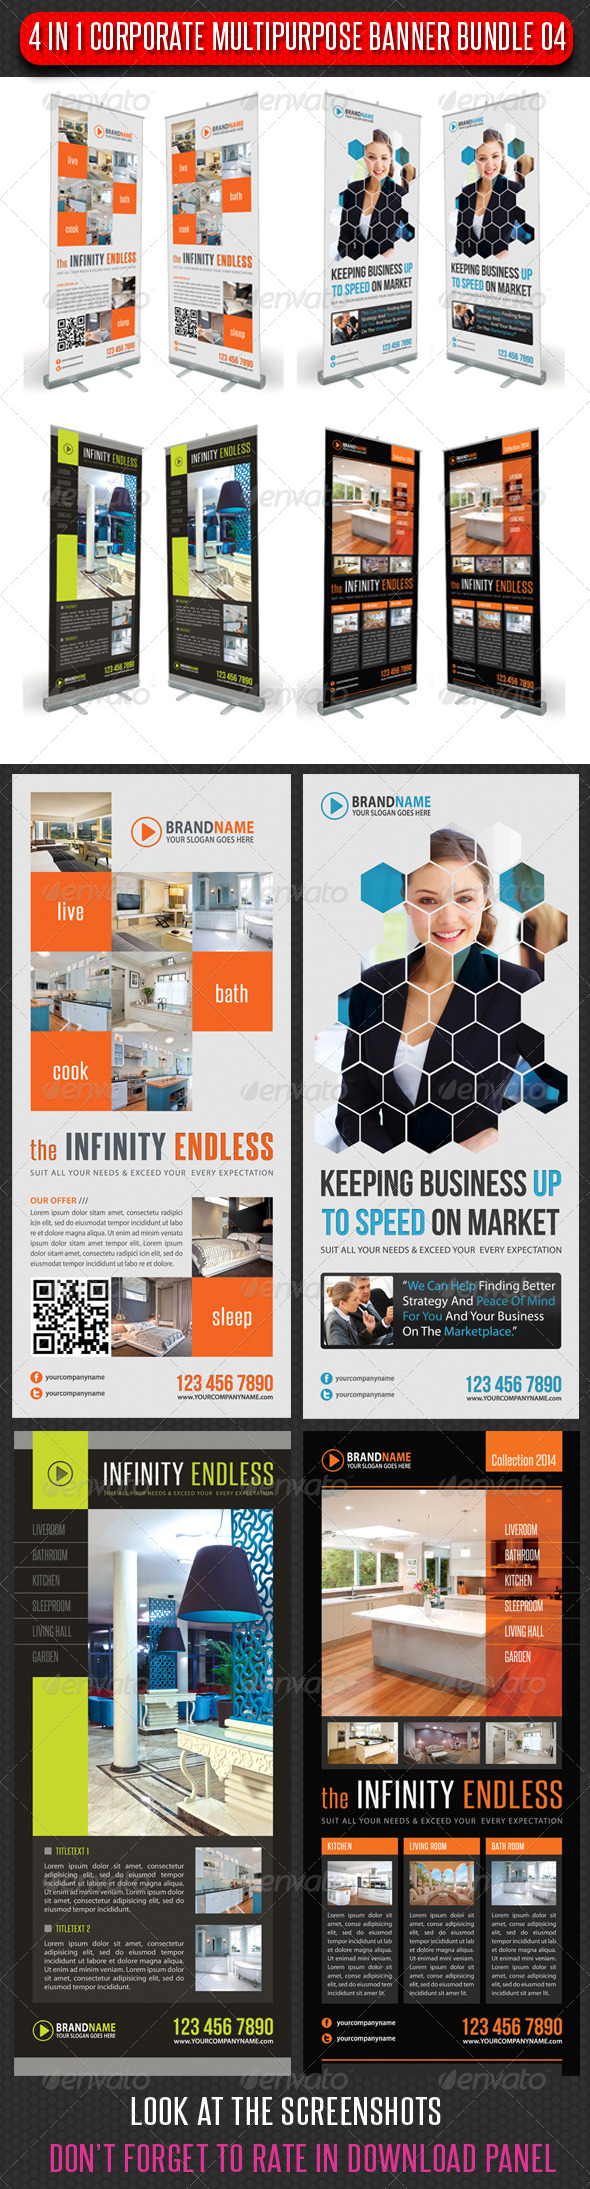 GraphicRiver 4 in 1 Corporate Multipurpose Banner Bundle 04 6465291